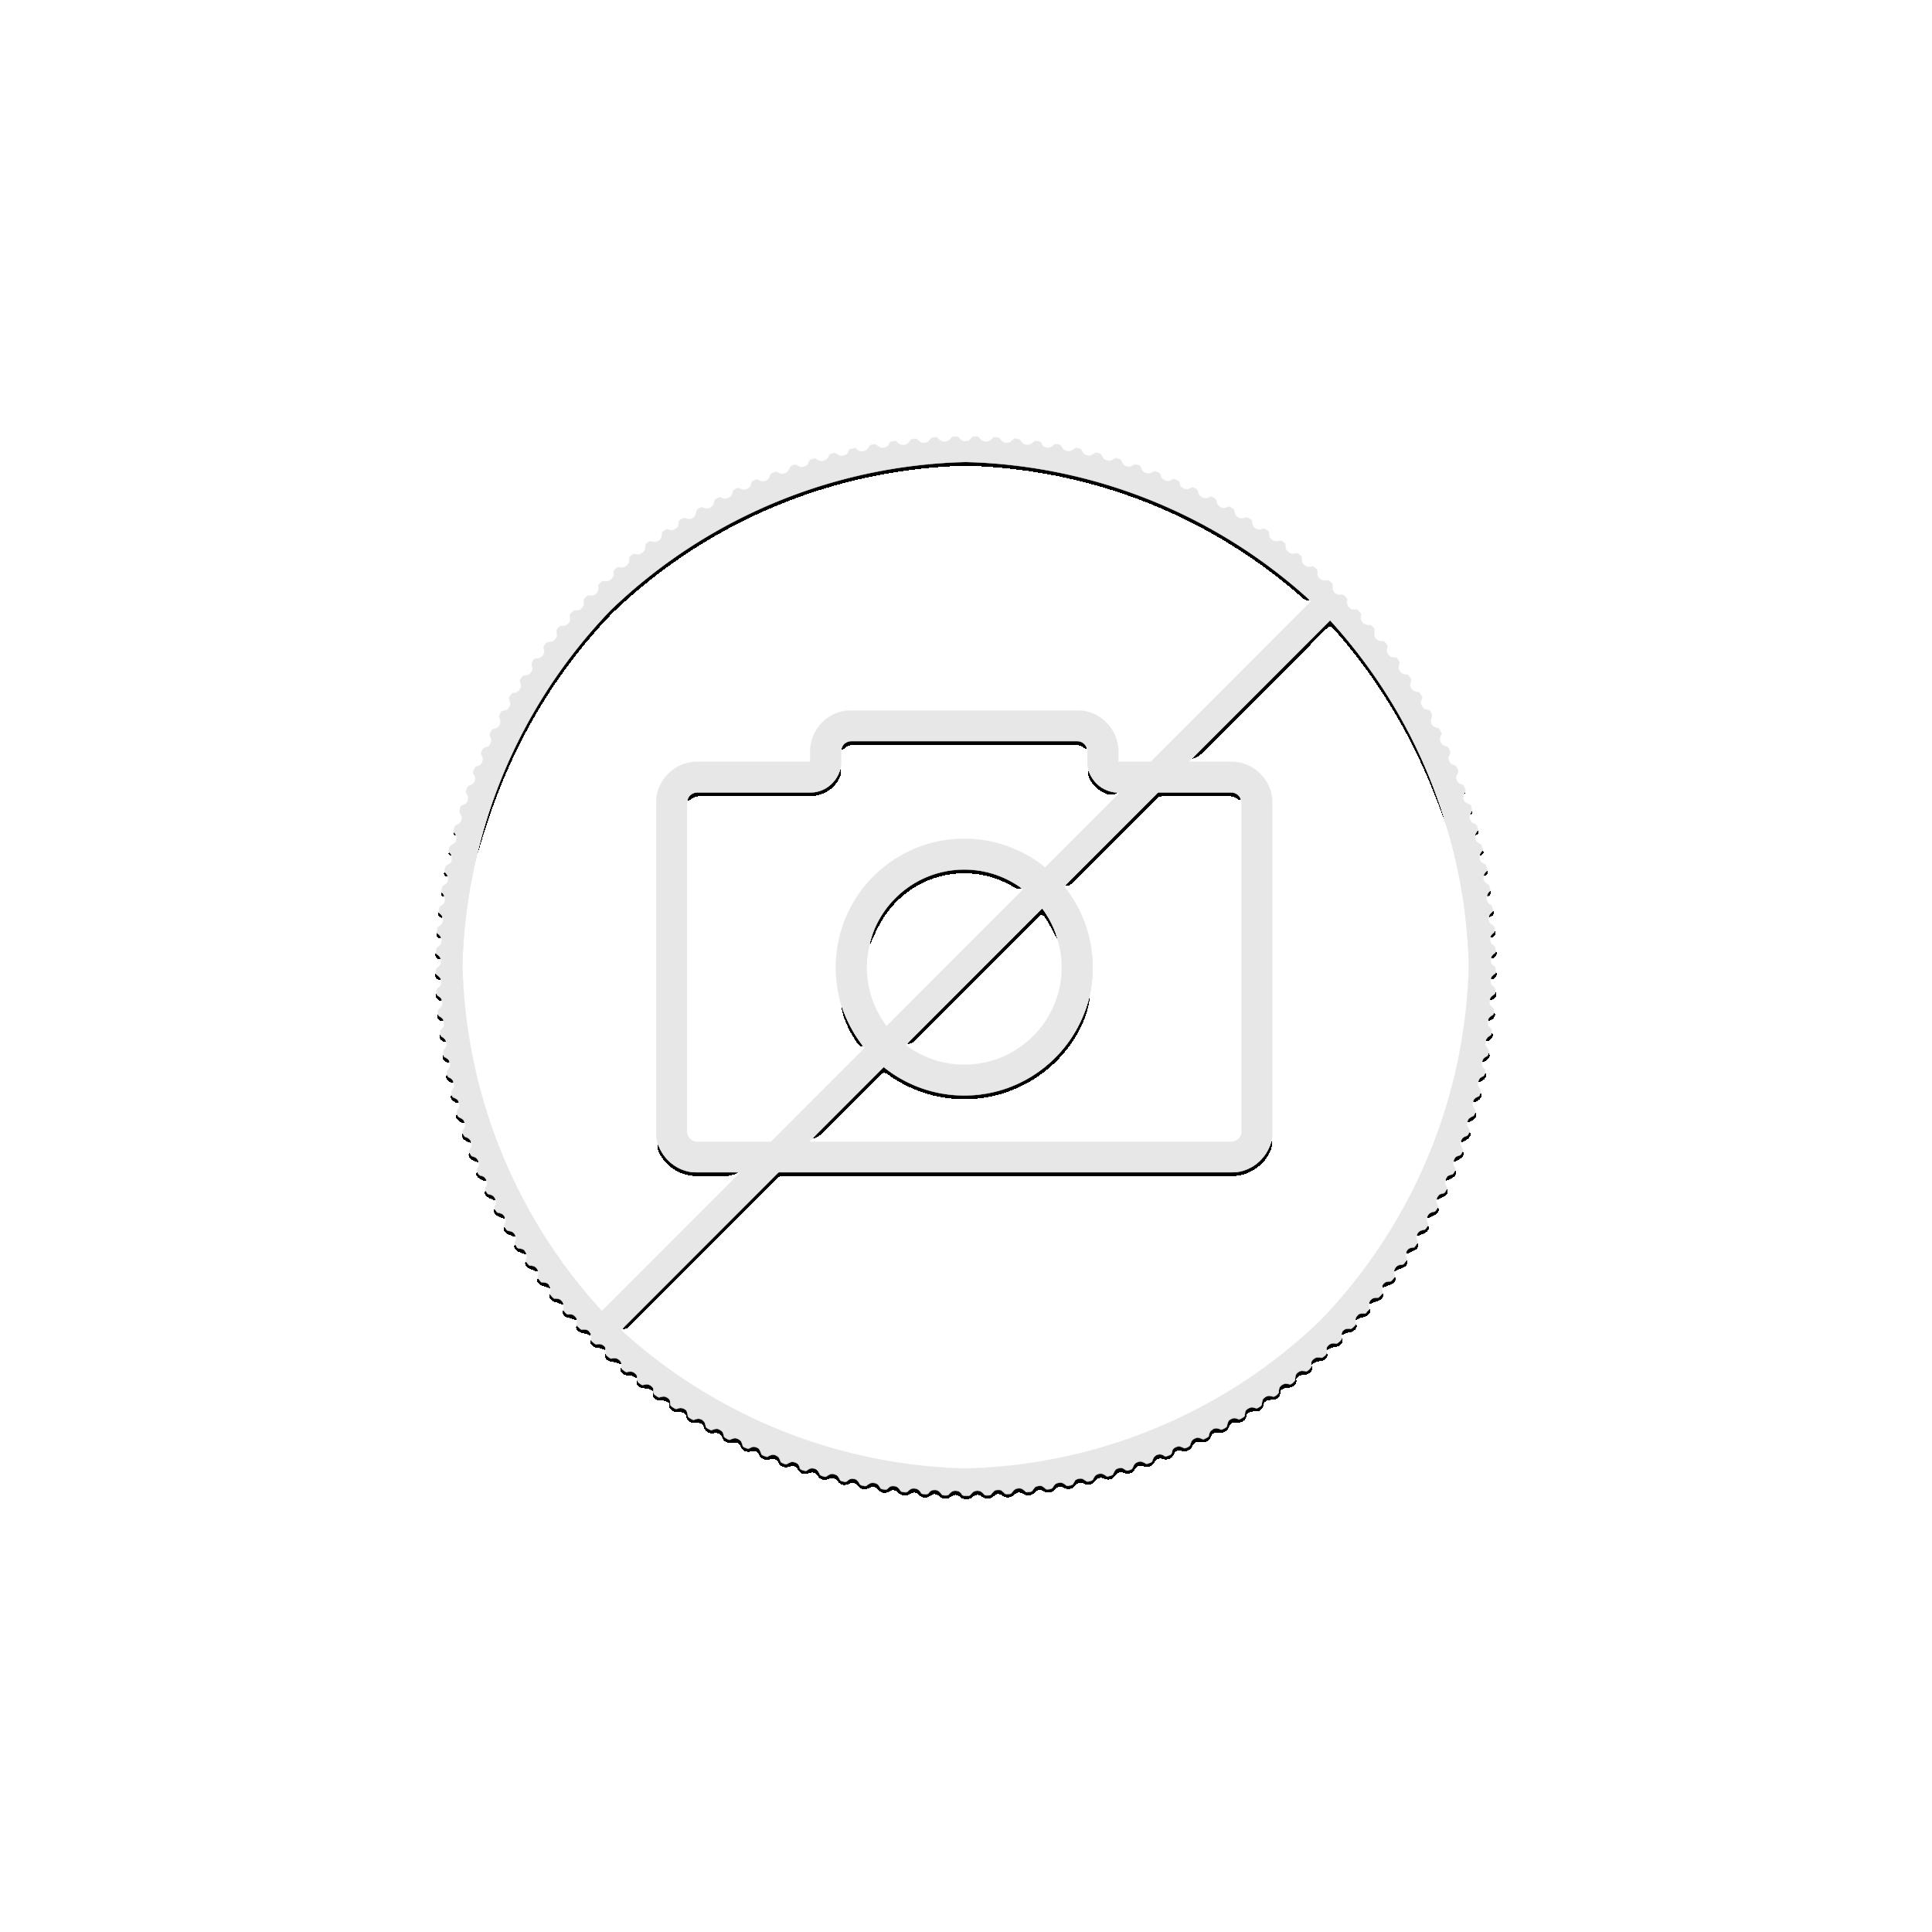 1 troy ounce zilveren munt Panda golden ring 2021 - achterkant